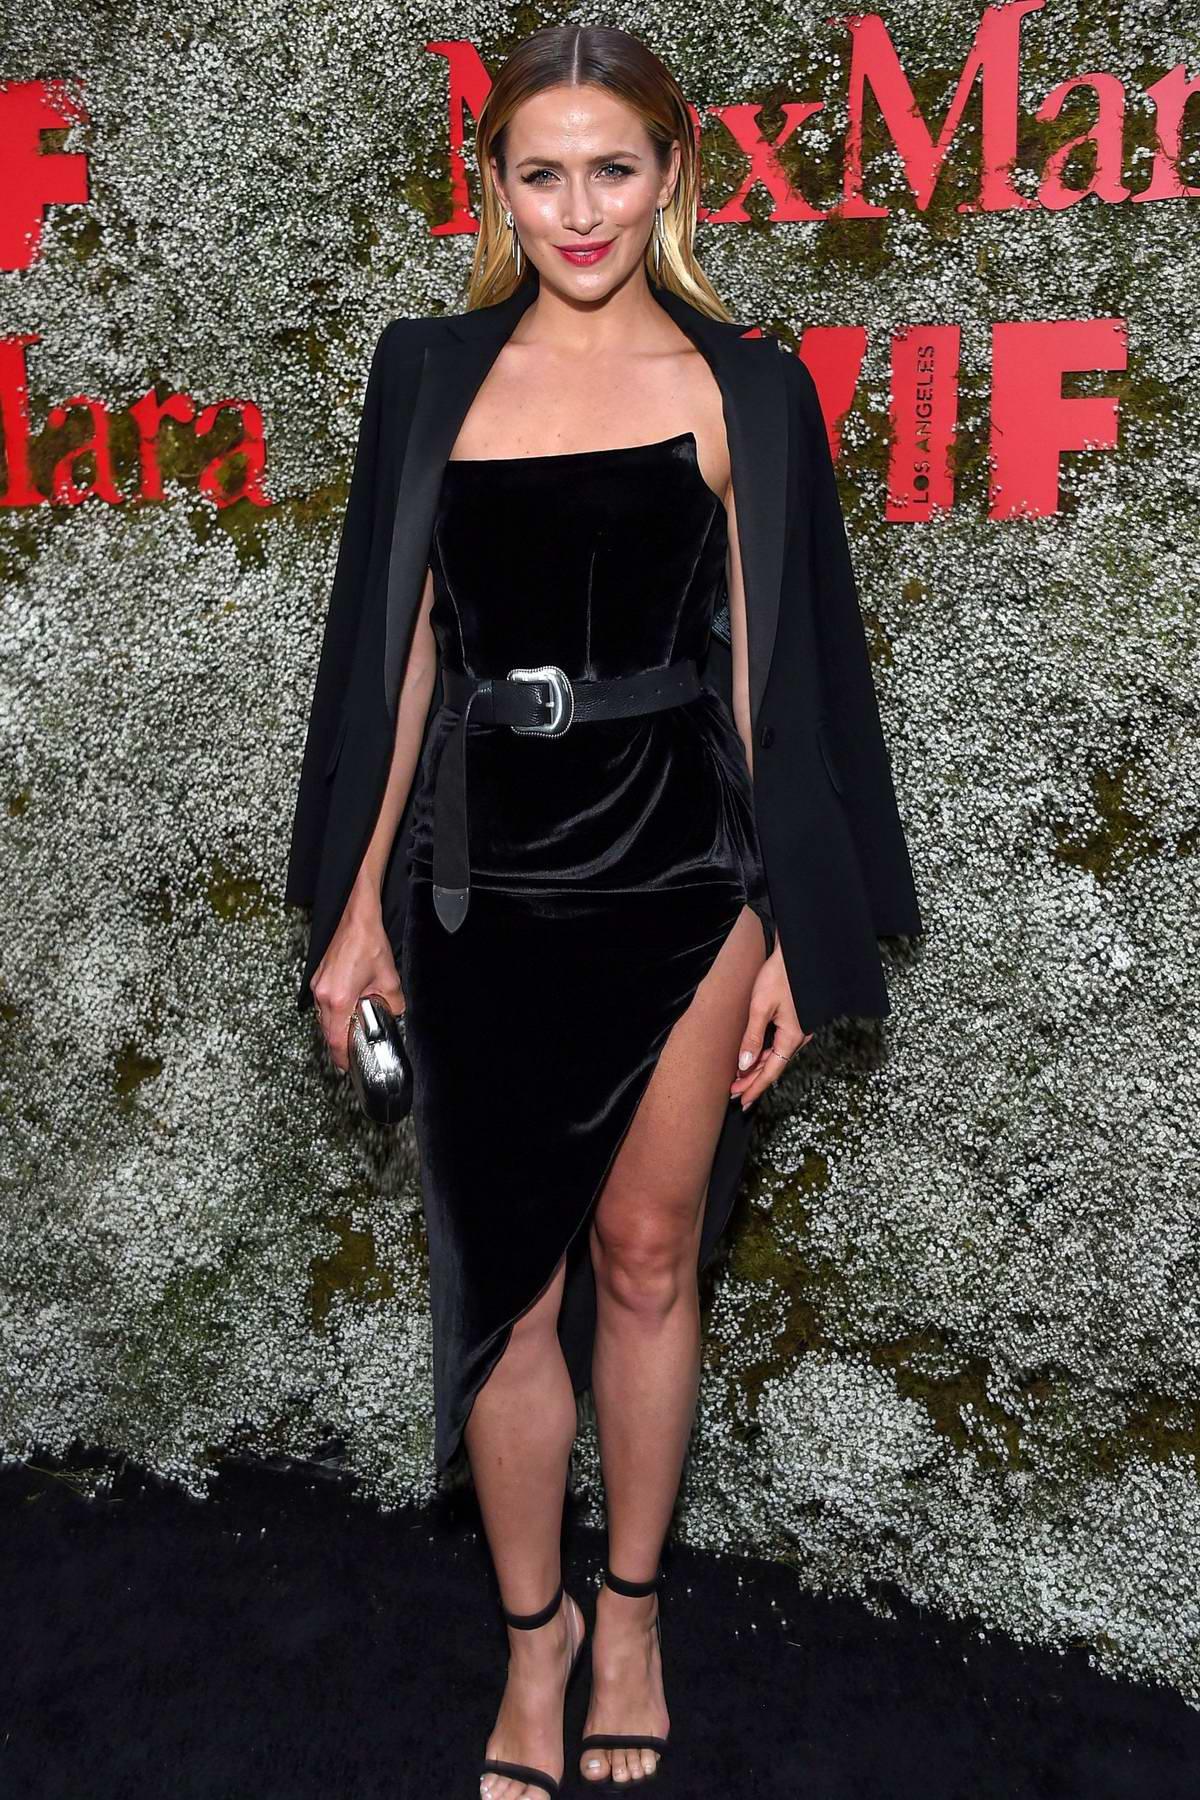 Shantel VanSanten attends the 2019 Women In Film Max Mara Face Of The Future in Los Angeles